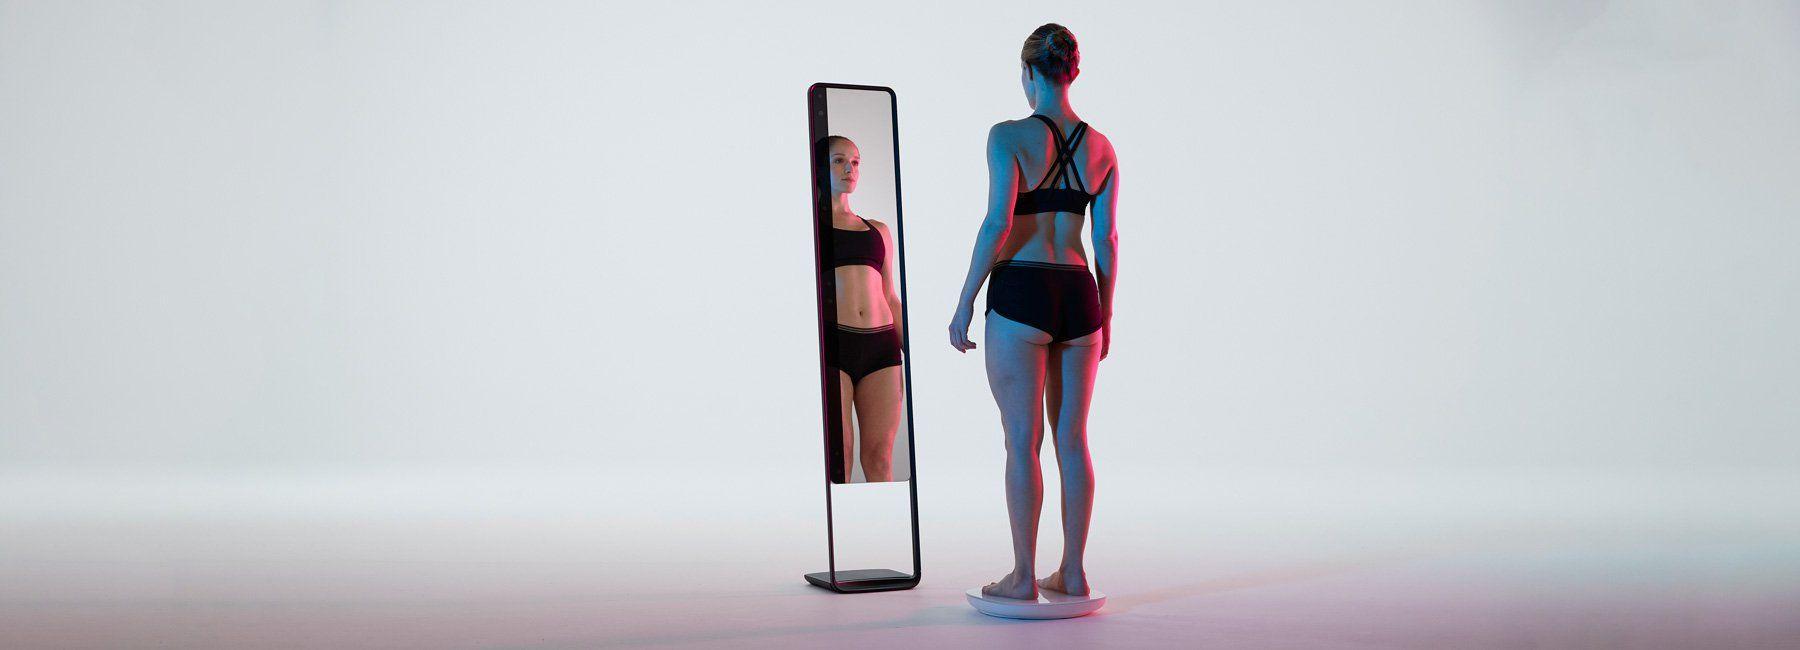 naked-labs-3d-espejo inteligente-loqueva (5)